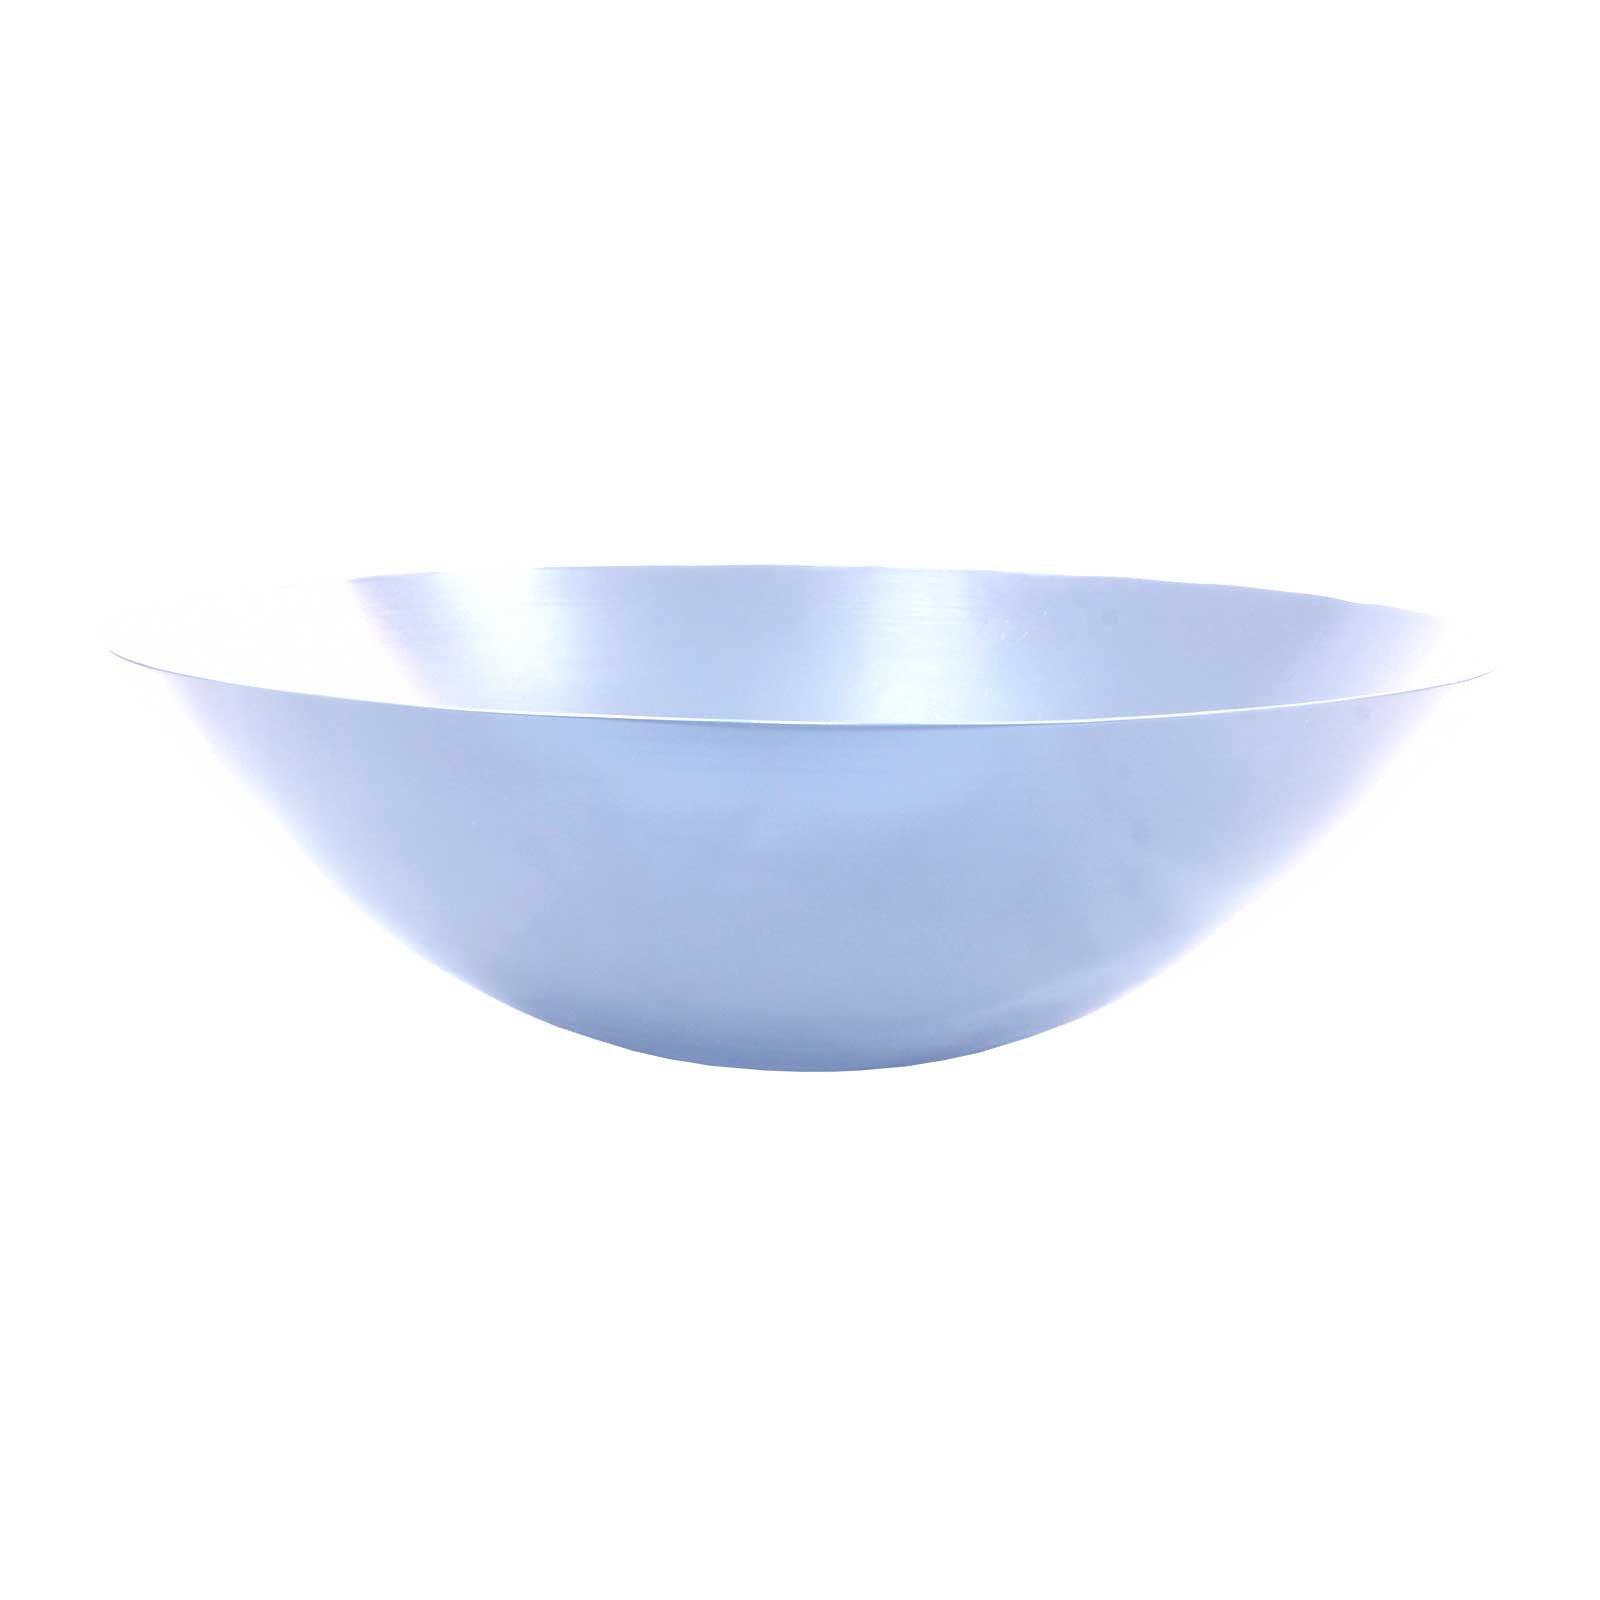 Oso Large Polar Aluminum Bowl